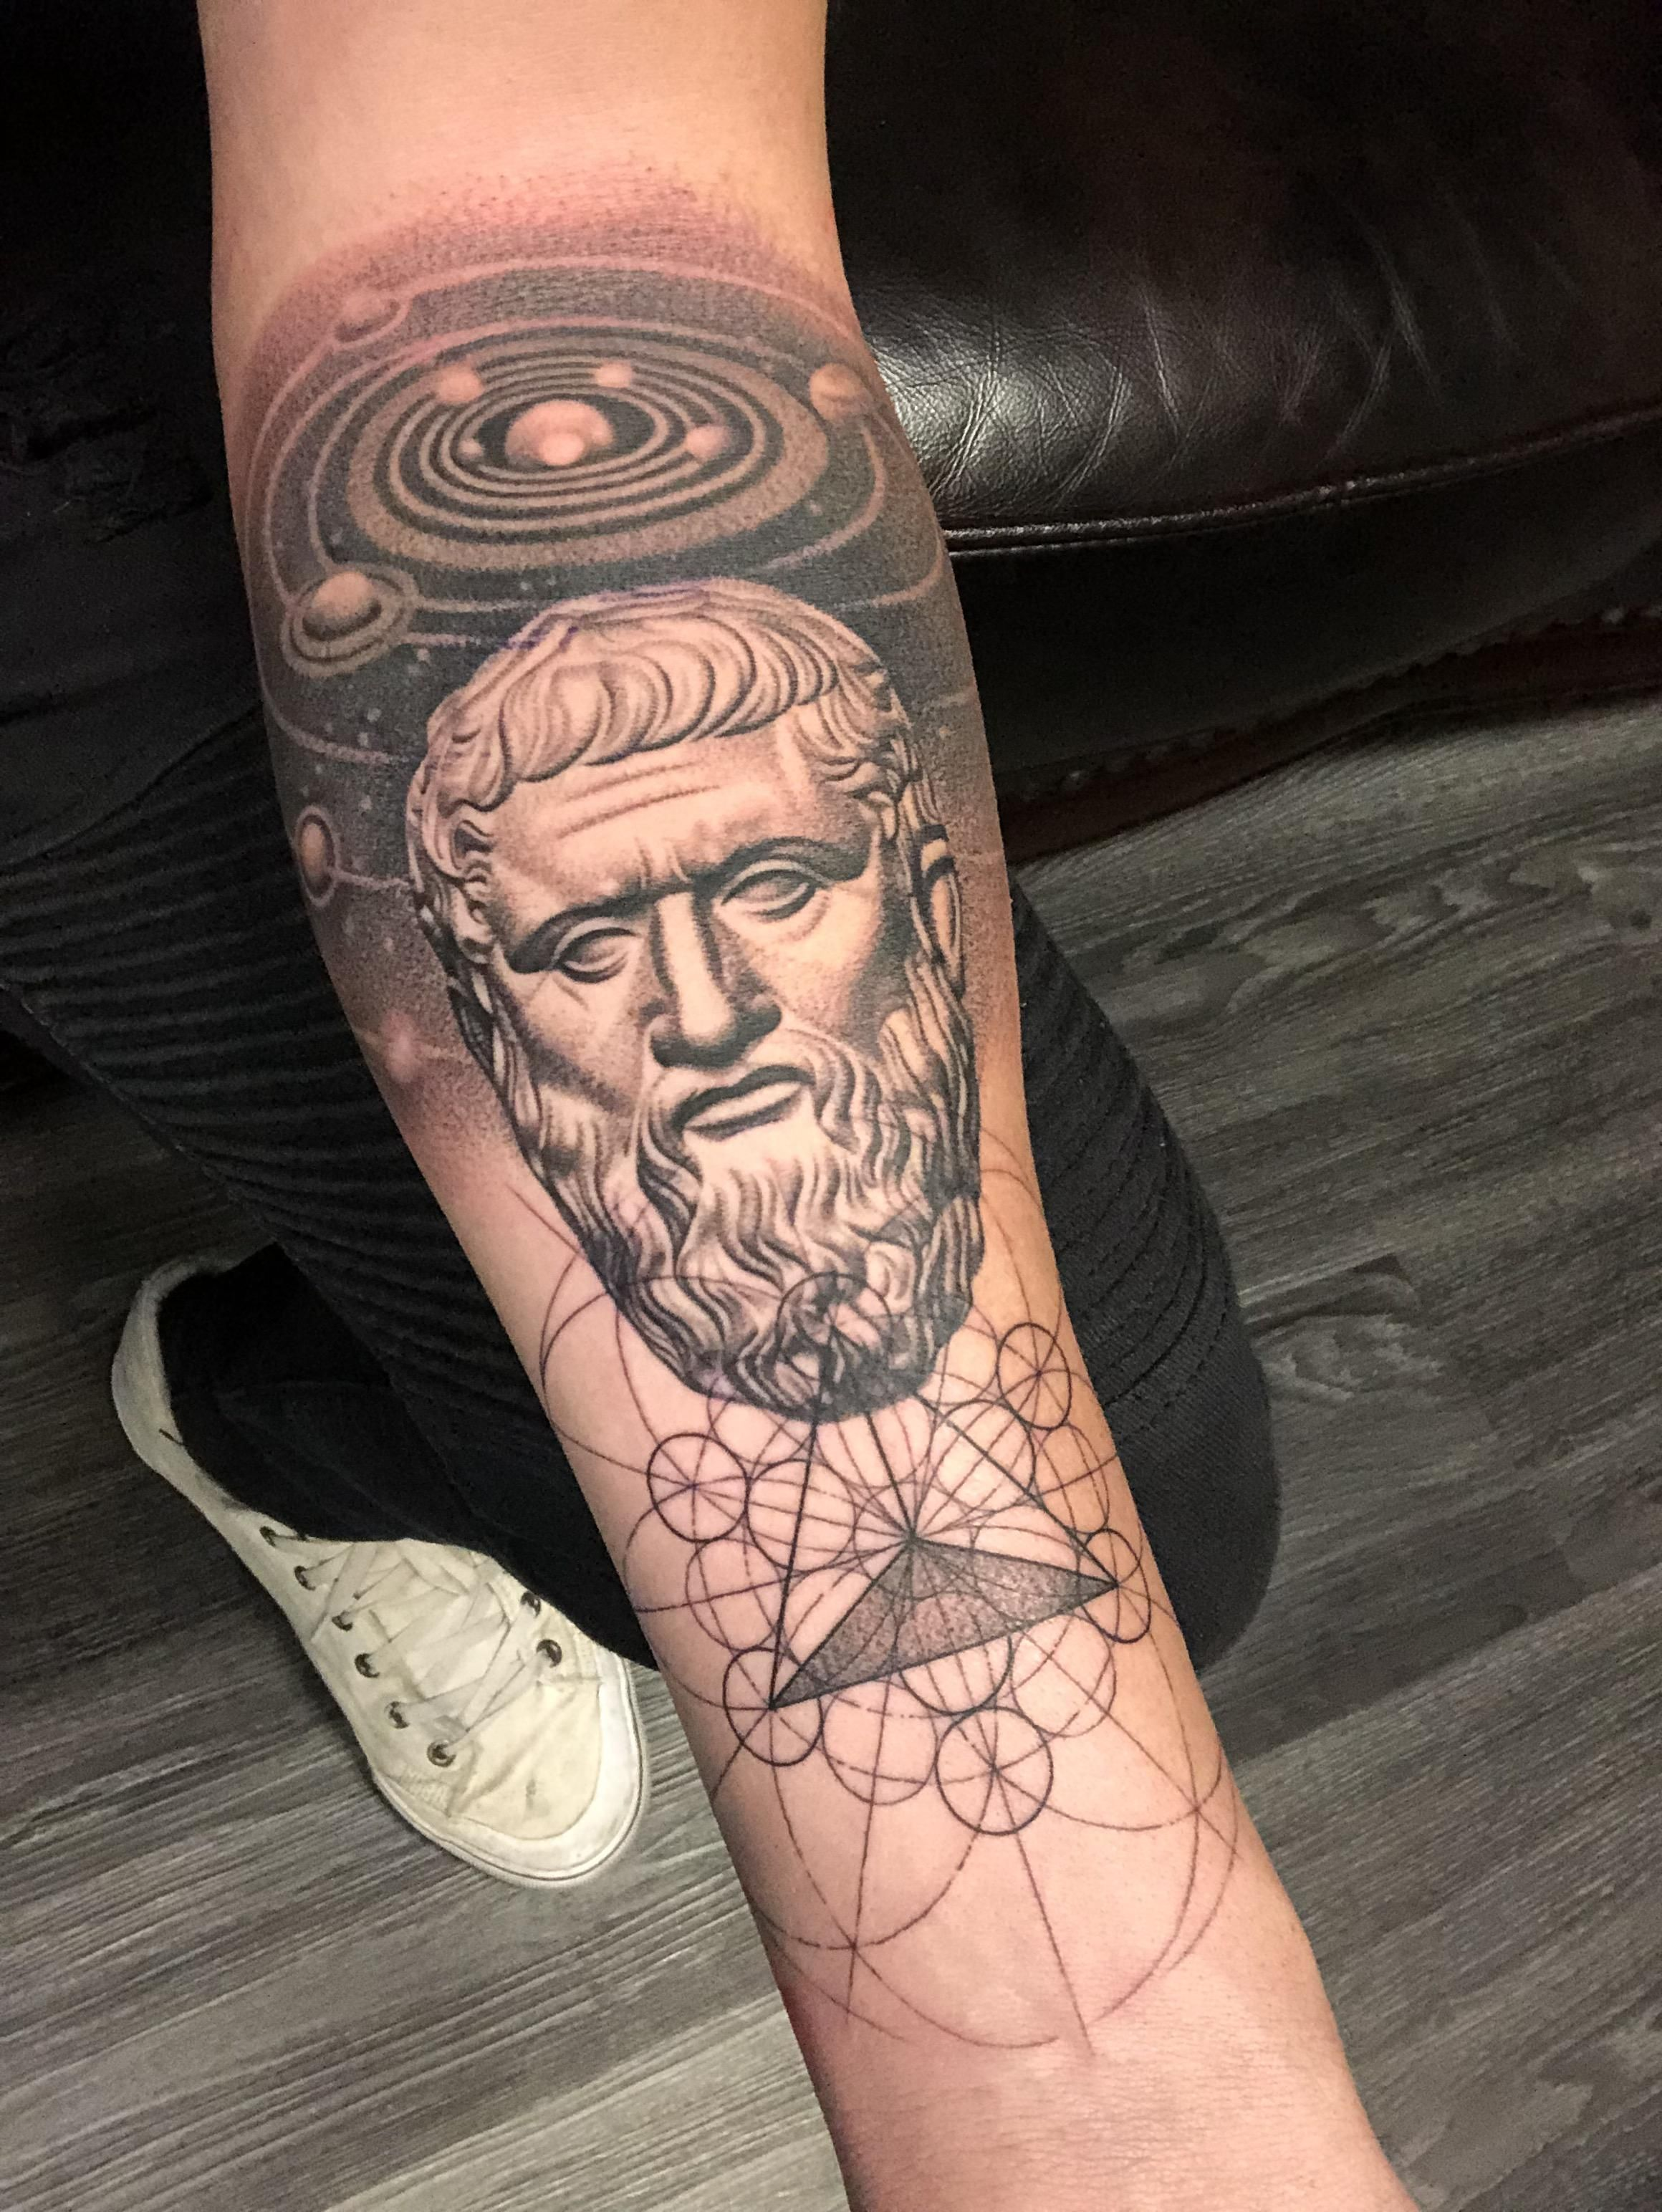 Plato By Kiljun From South Korea Done At Seven Tattoo Studio In Las Vegas Nevada Tattoos Tattoo Studio Tattoo Las Vegas